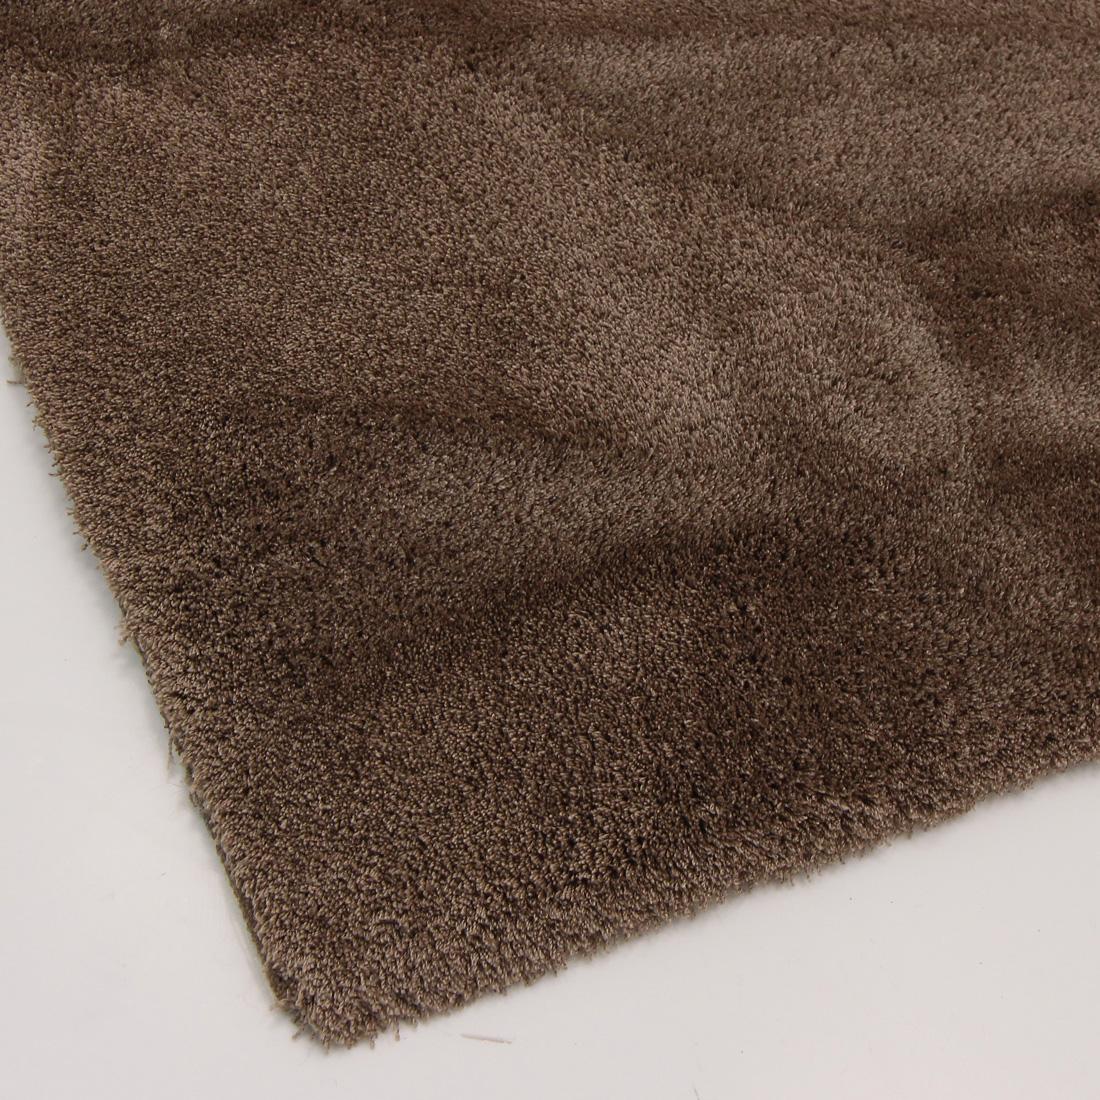 Vloerkleed Xilento Silky Soft Koper | 200 x 300 cm